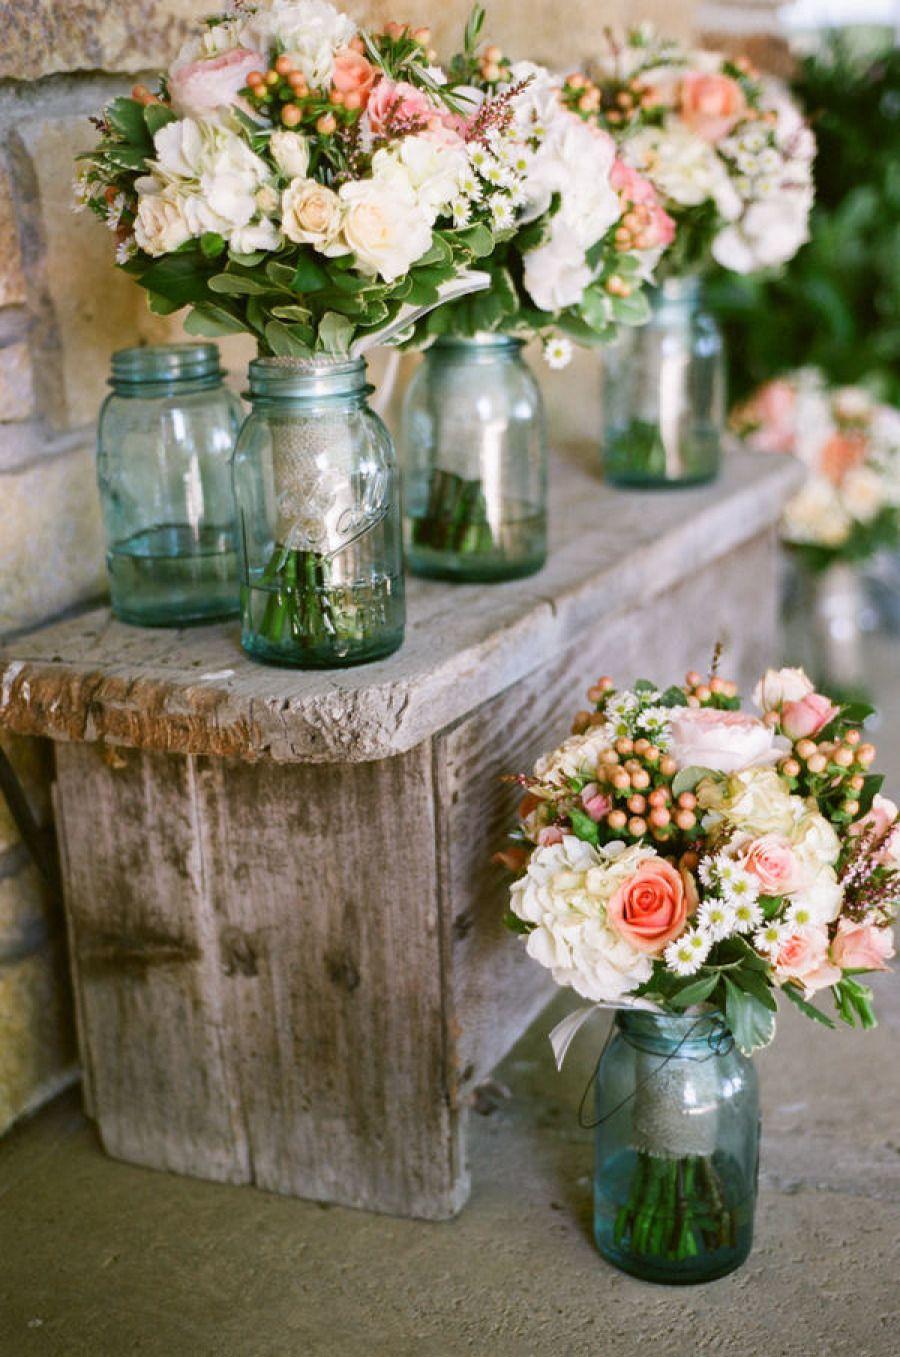 Mason Jar Wedding Decorations Montgomery Weddingamy Majors Photography  Mason Jar Vases